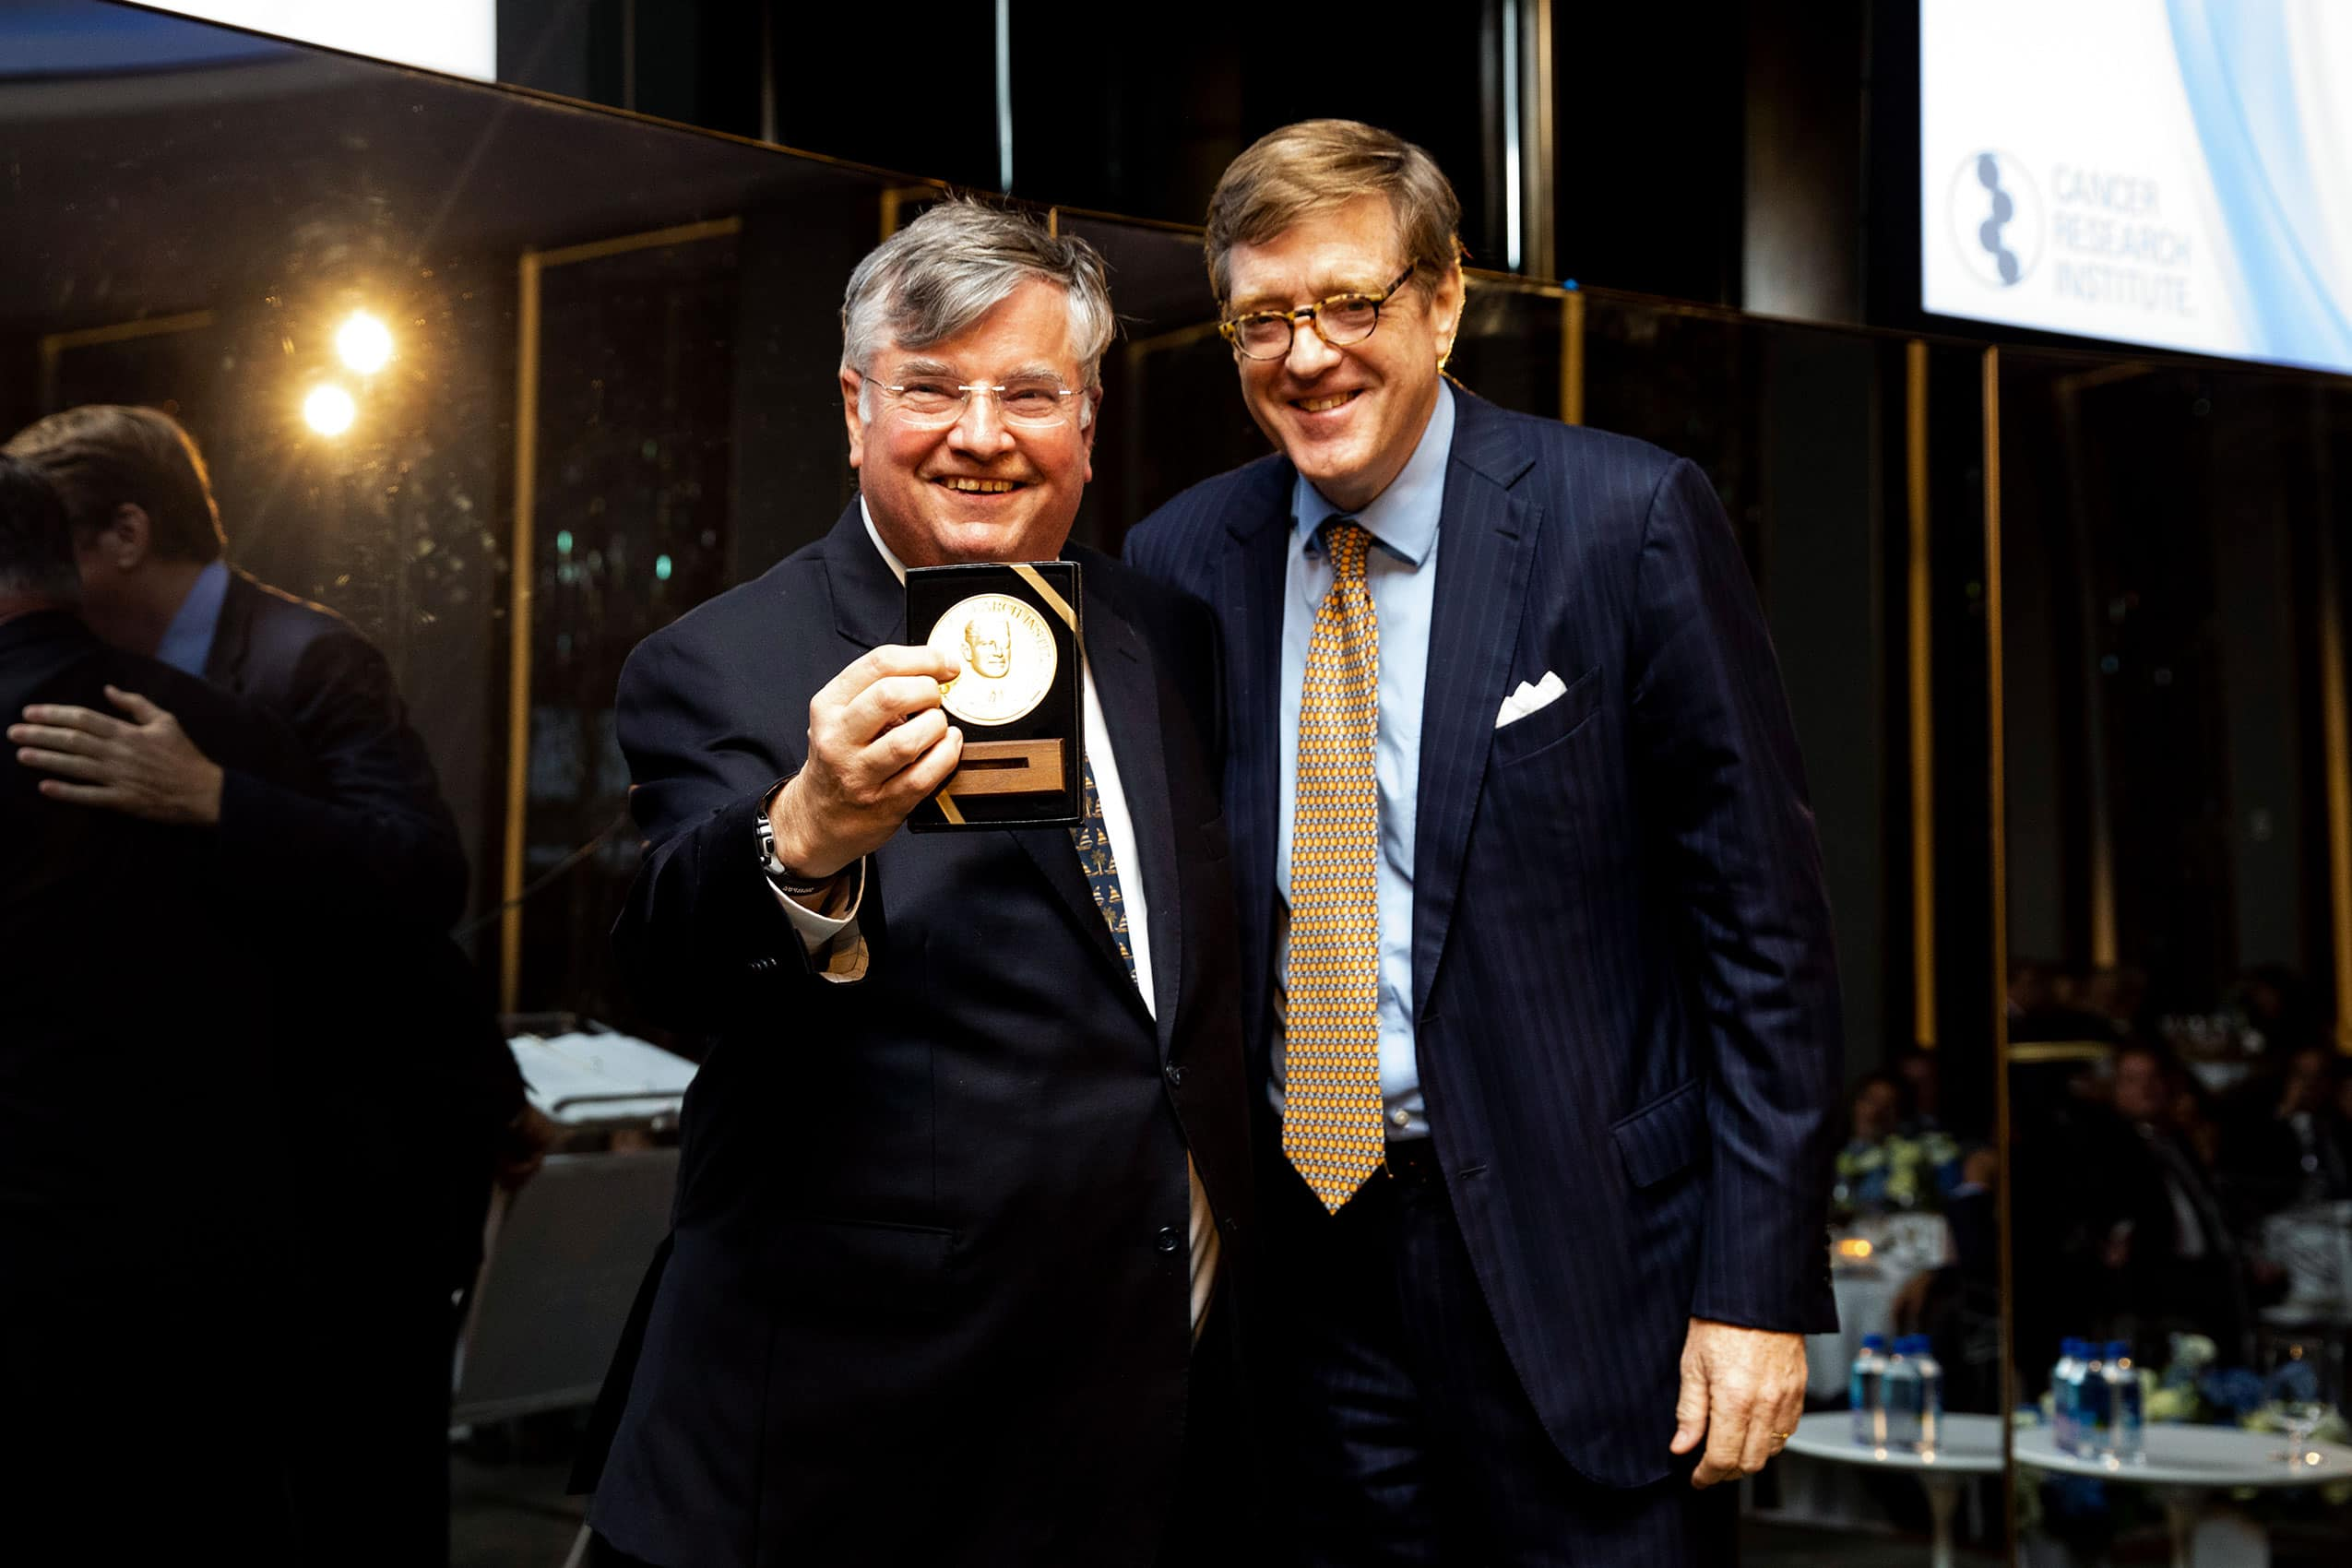 Oliver R. Grace, Jr. and Paul Shiverick